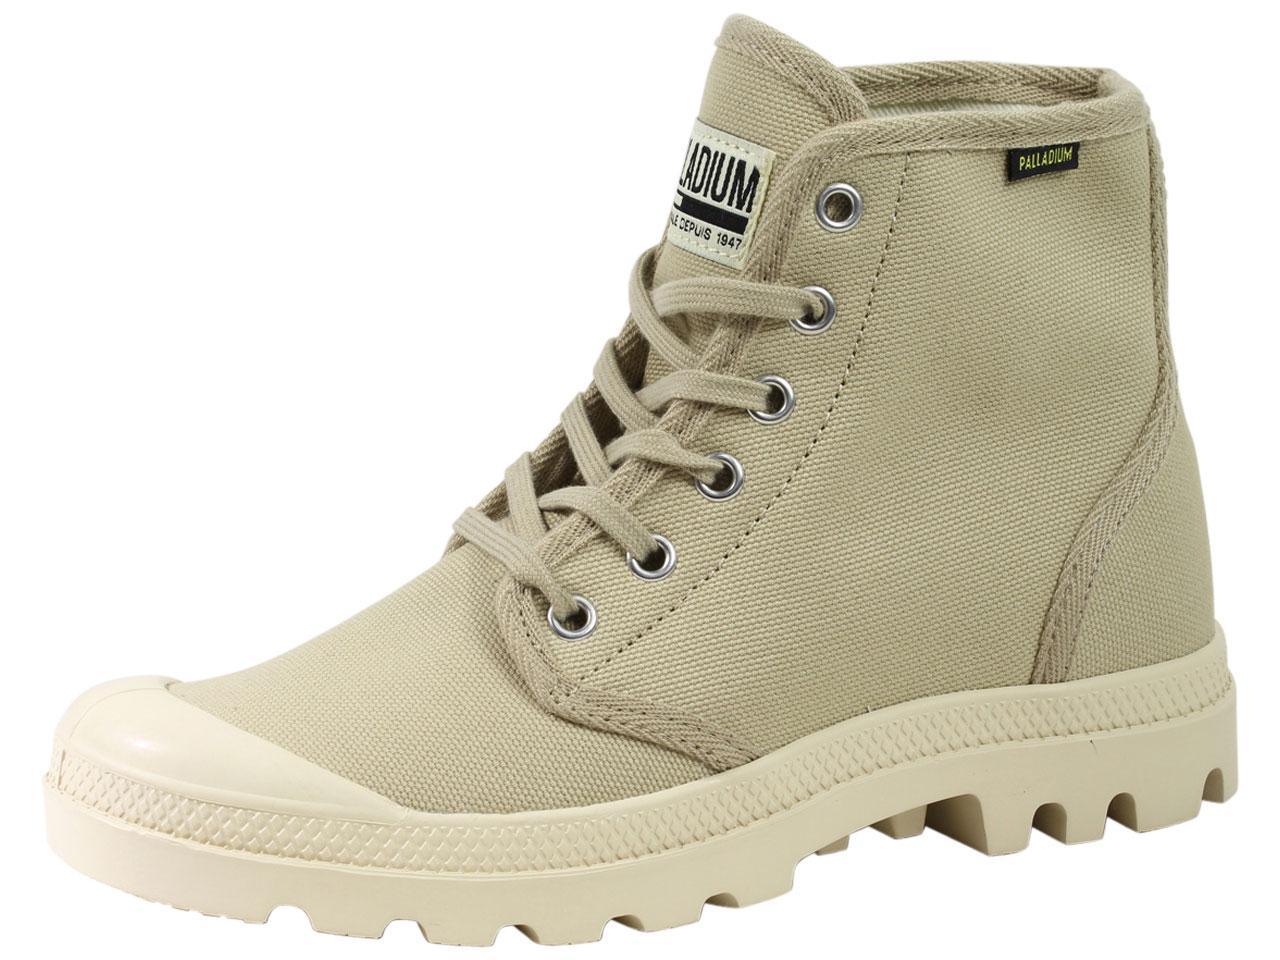 Image of Palladium Men's Pampa Hi Originale Chukka Boots Shoes - Beige - 7.5 D(M) US/9 B(M) US